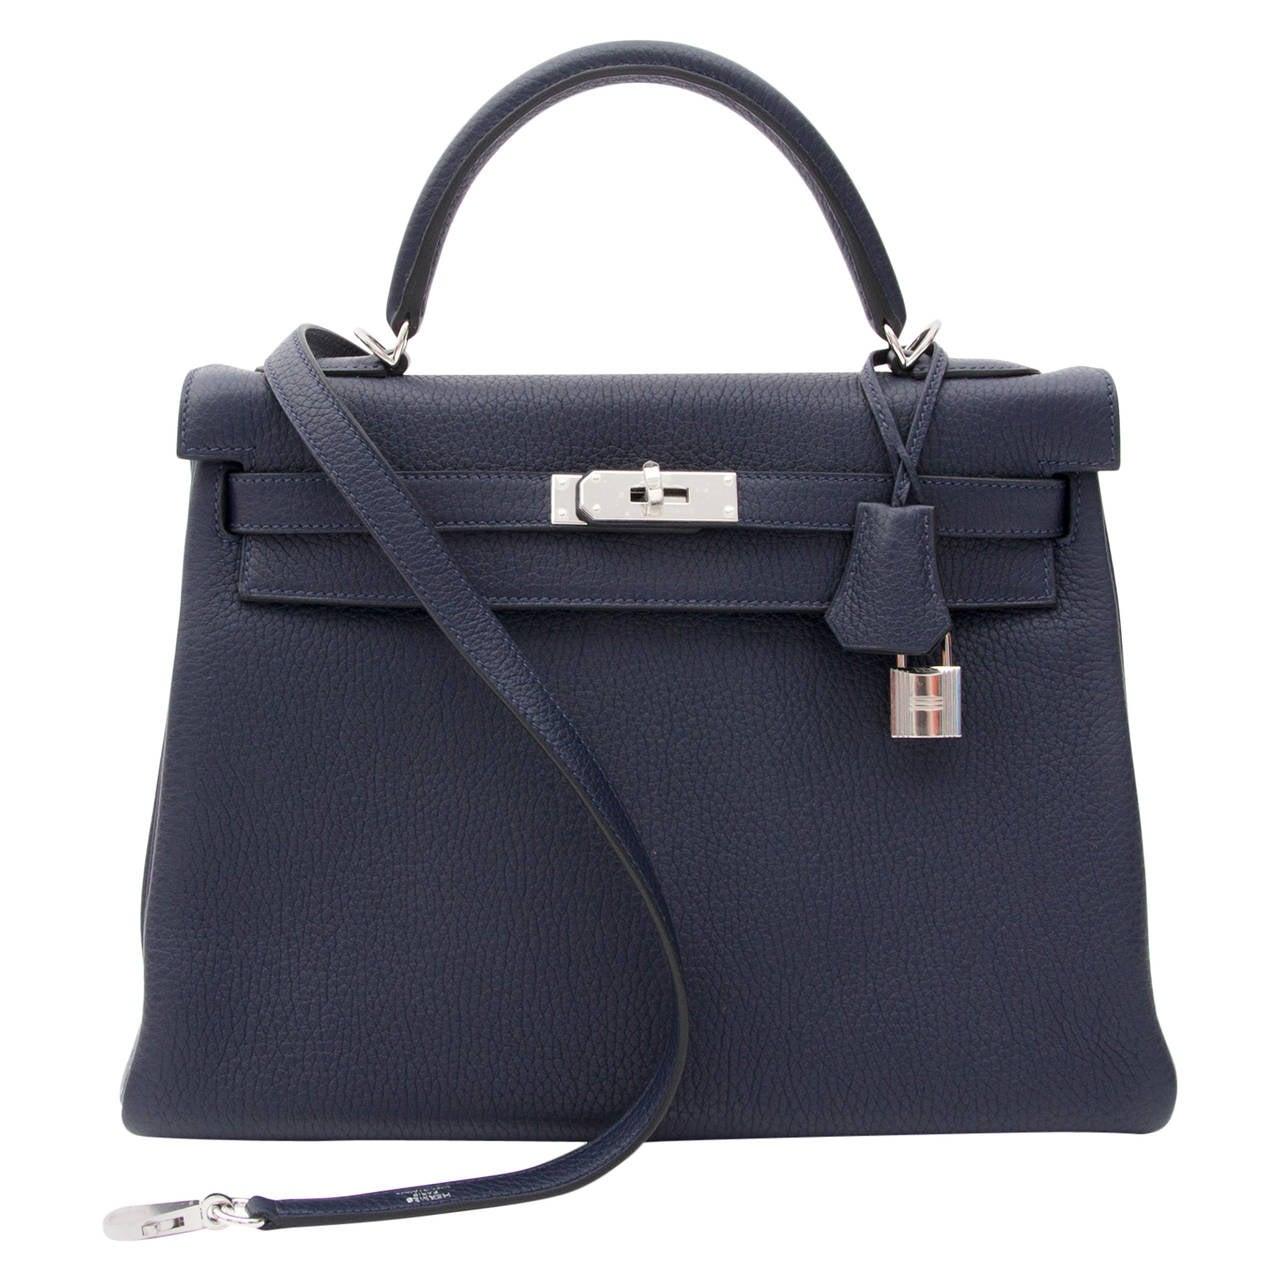 e06e14064171 ... wholesale brand new hermès kelly bag taurillon clemence 32 blue nuit  for sale 2eb99 a039e